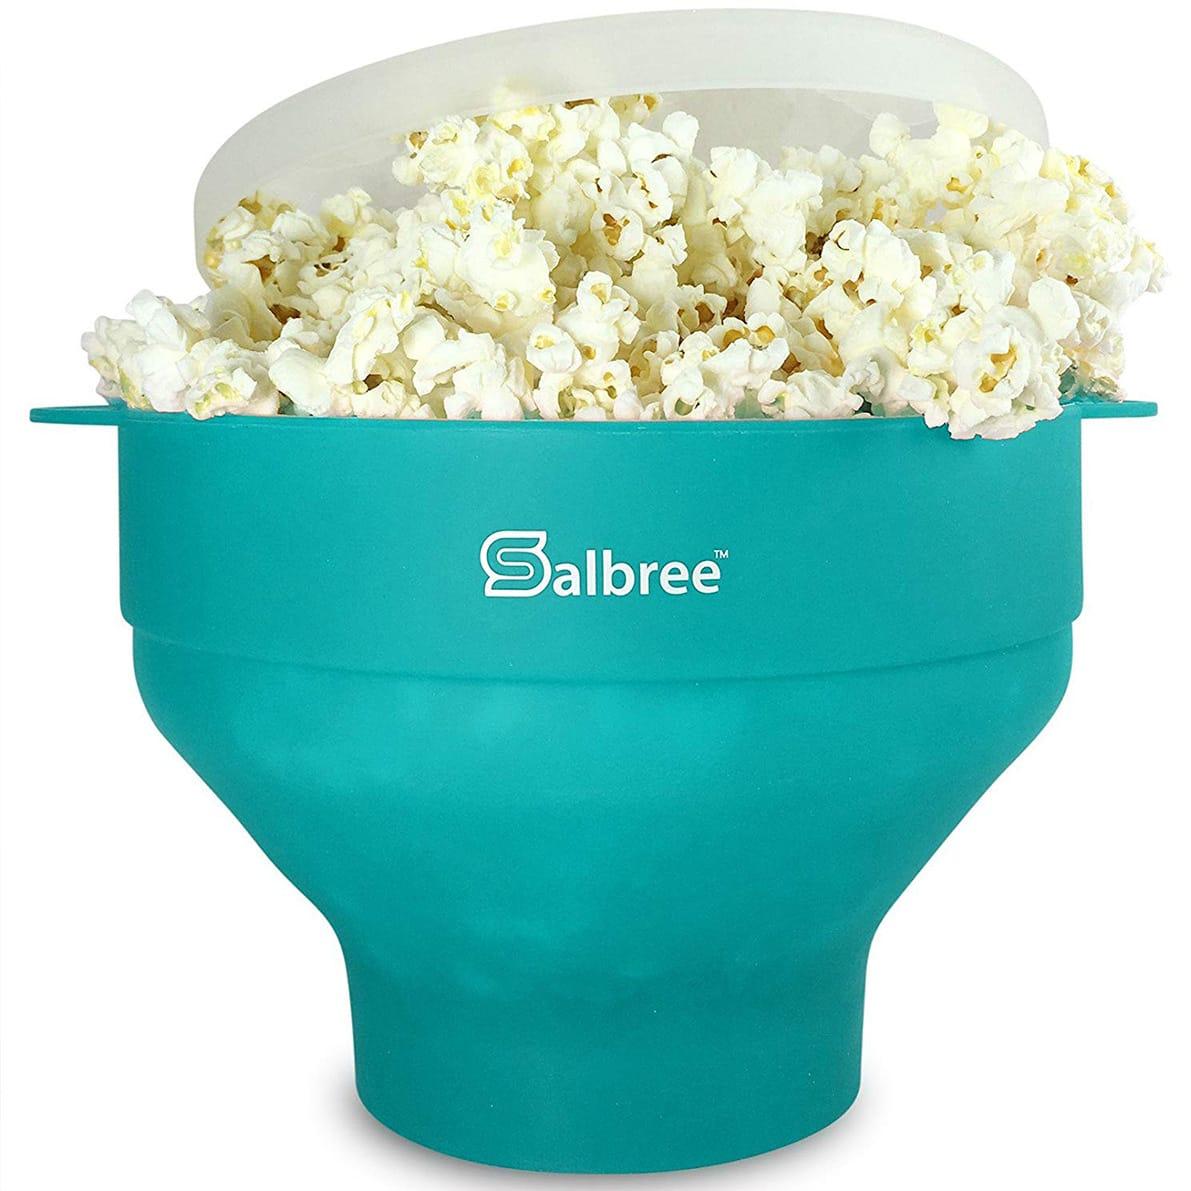 Salbree Popcorn Popper Bowl Review